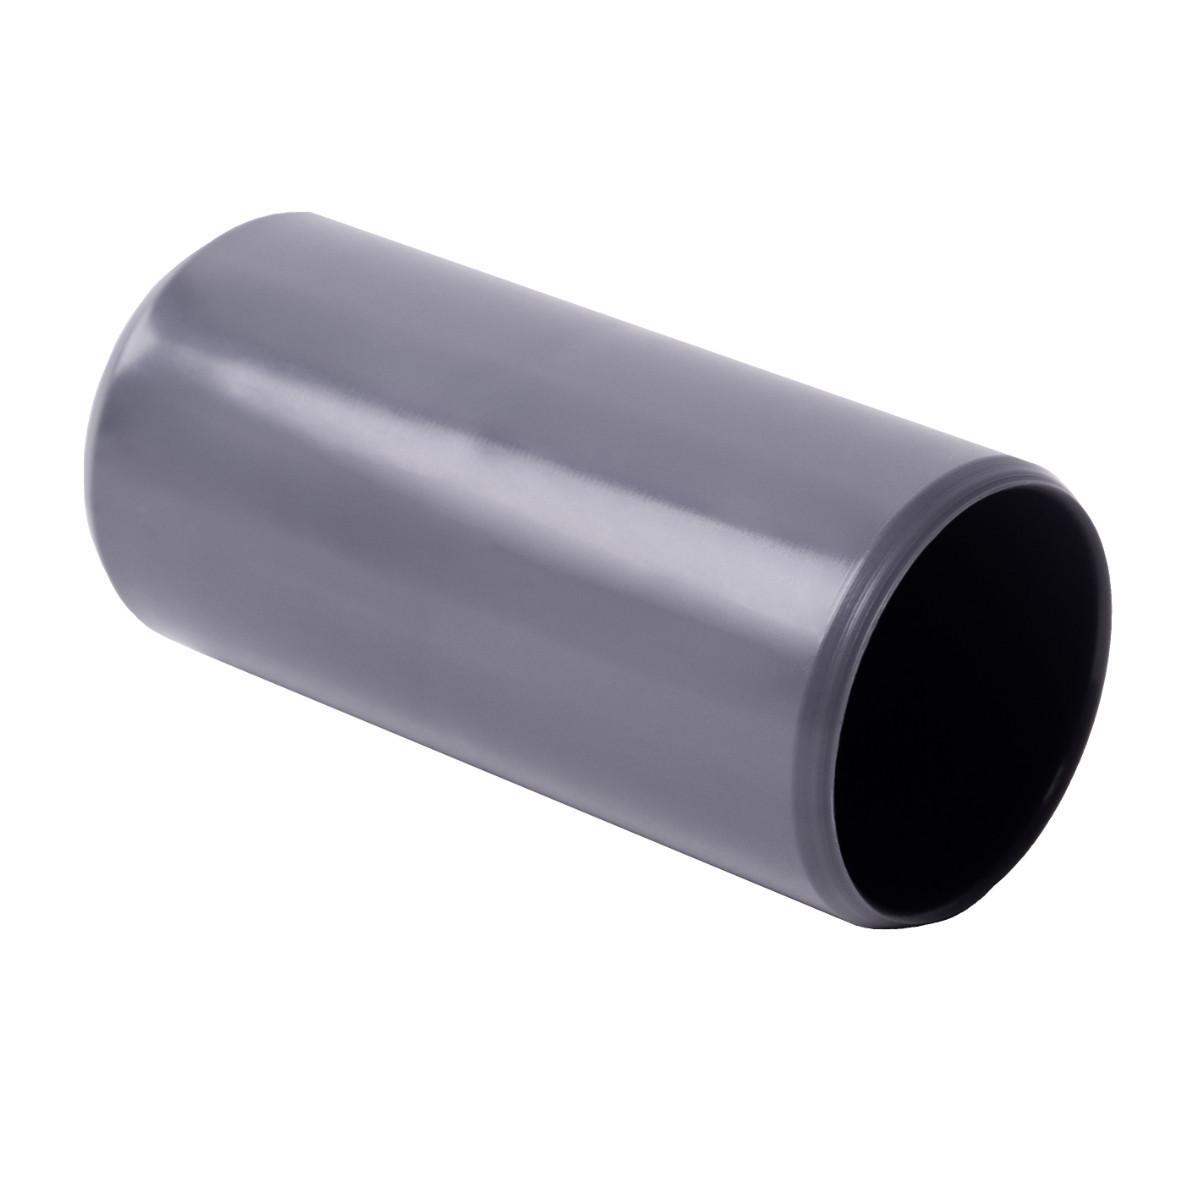 0220_LB Муфта для EN труб